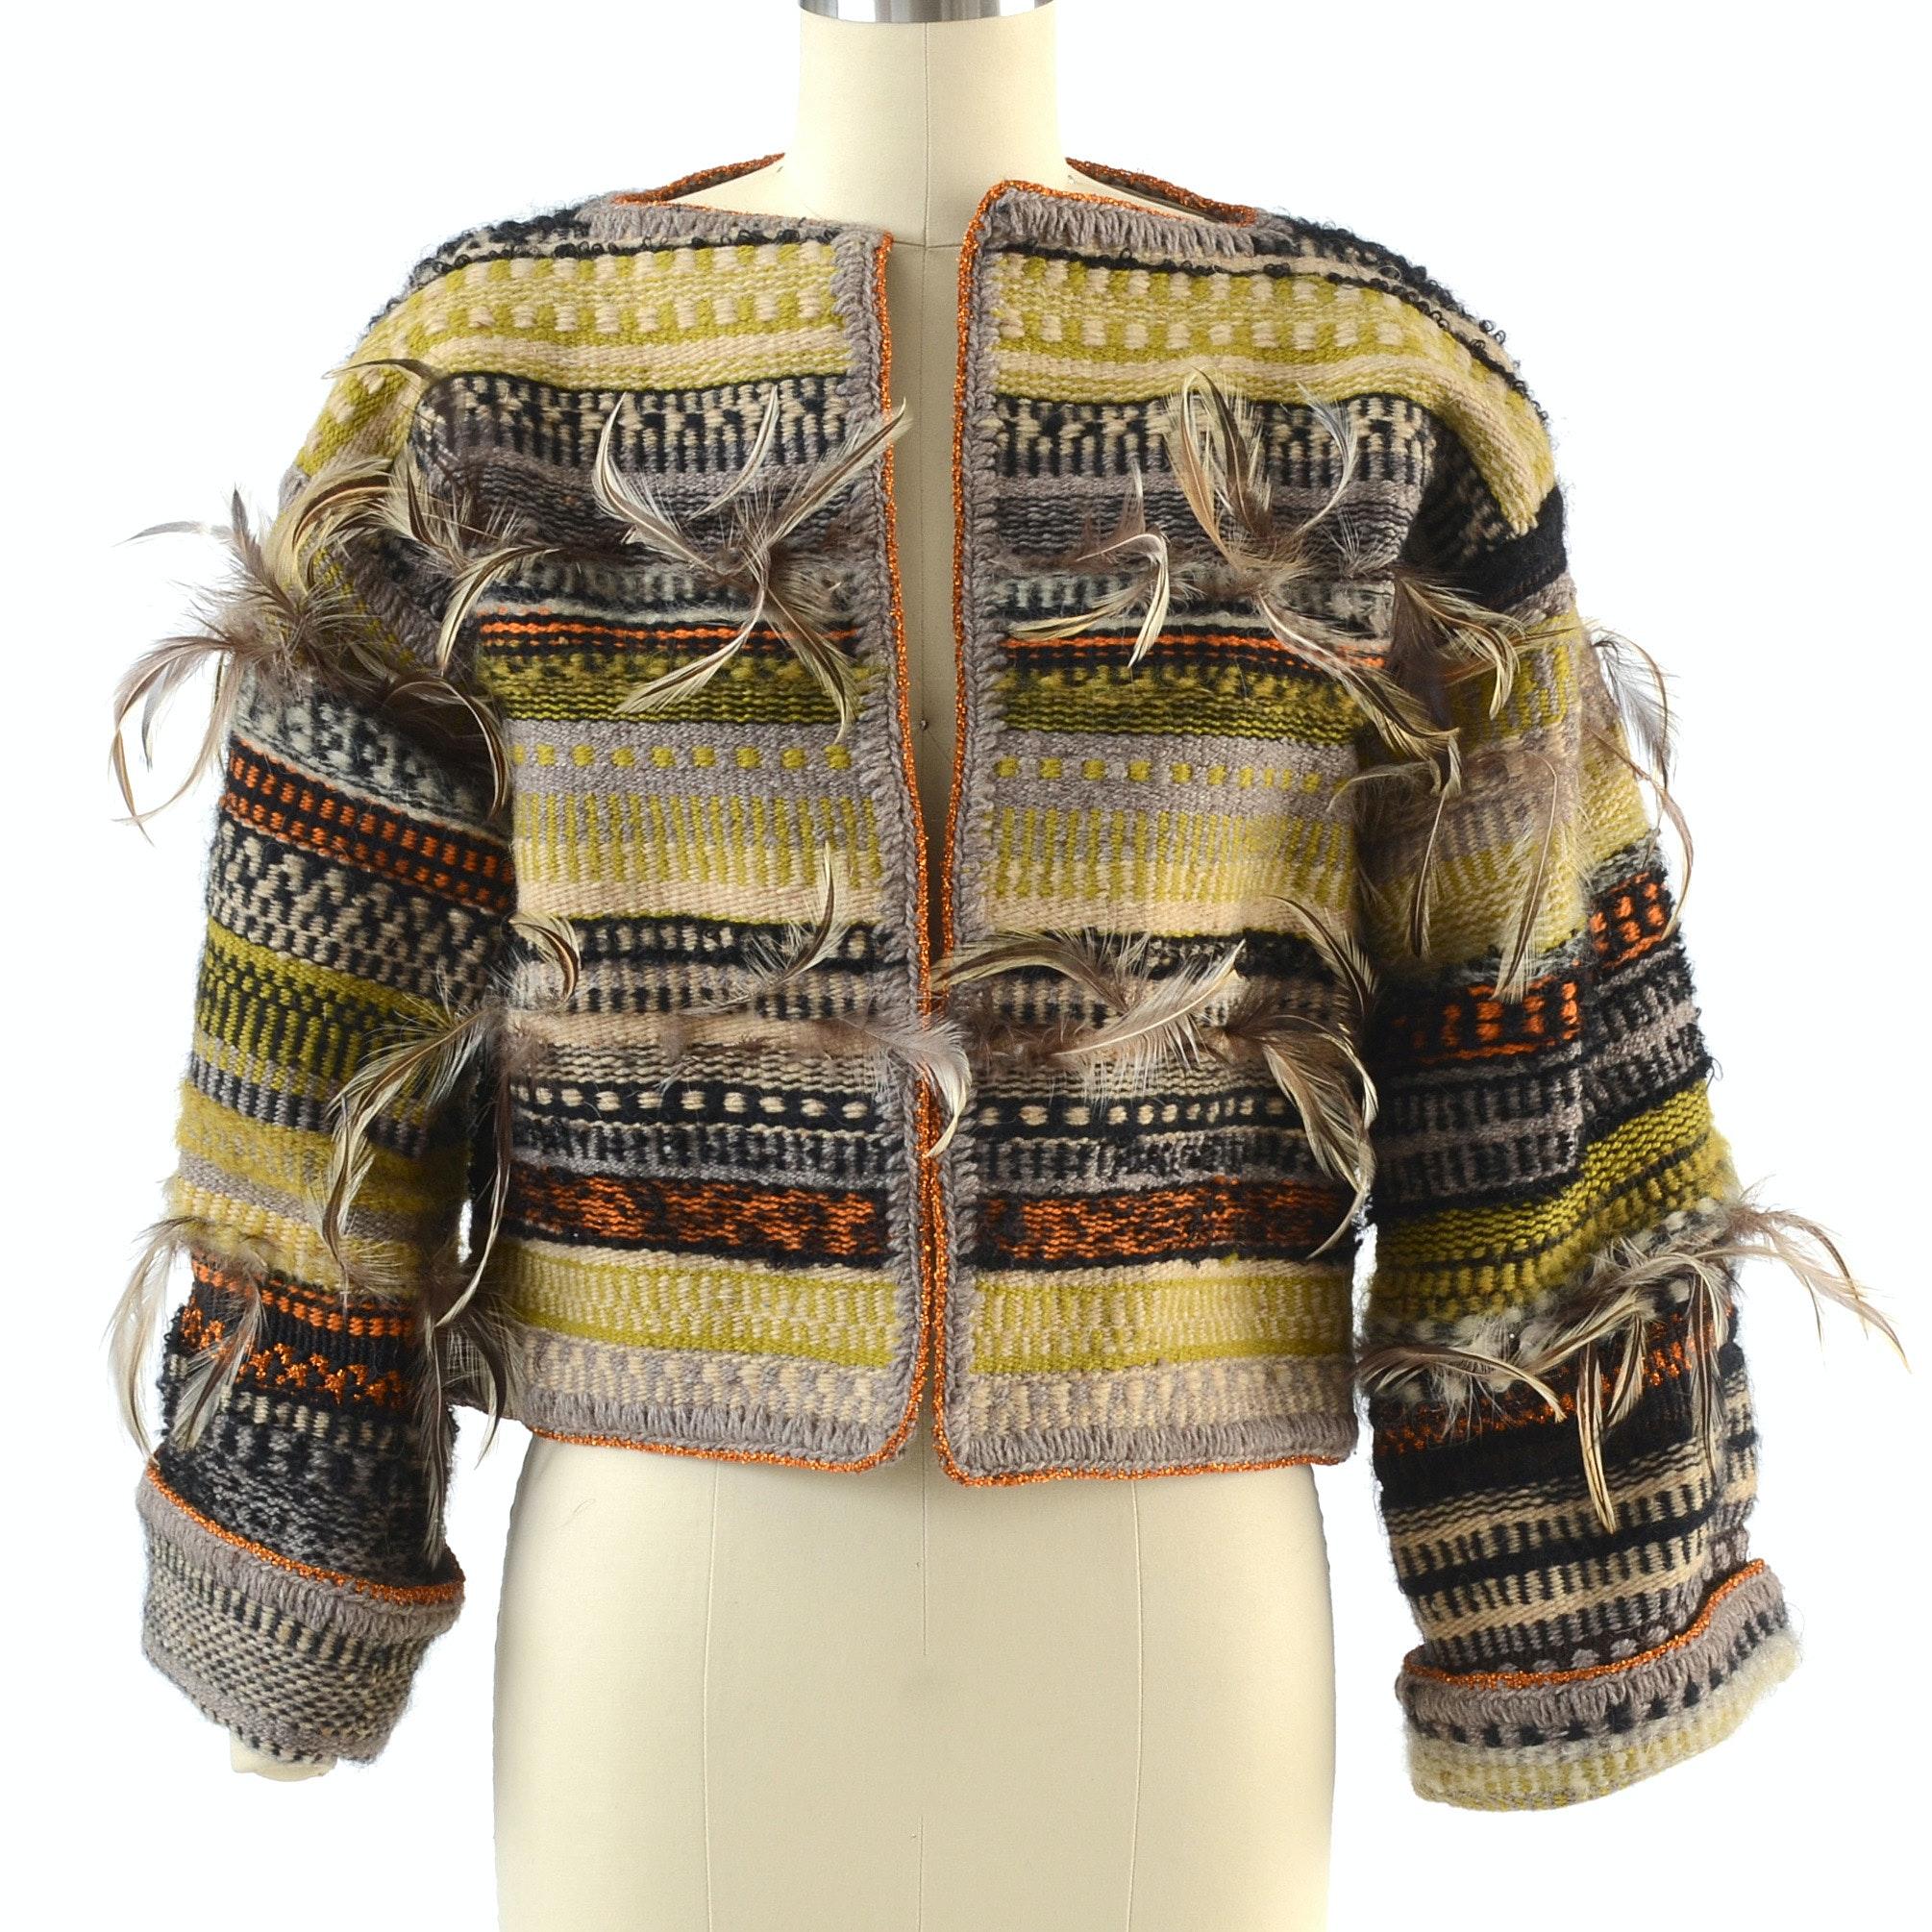 Michaele Vollbrach Wool Blanket Open Front Crop Jacket with Feathers